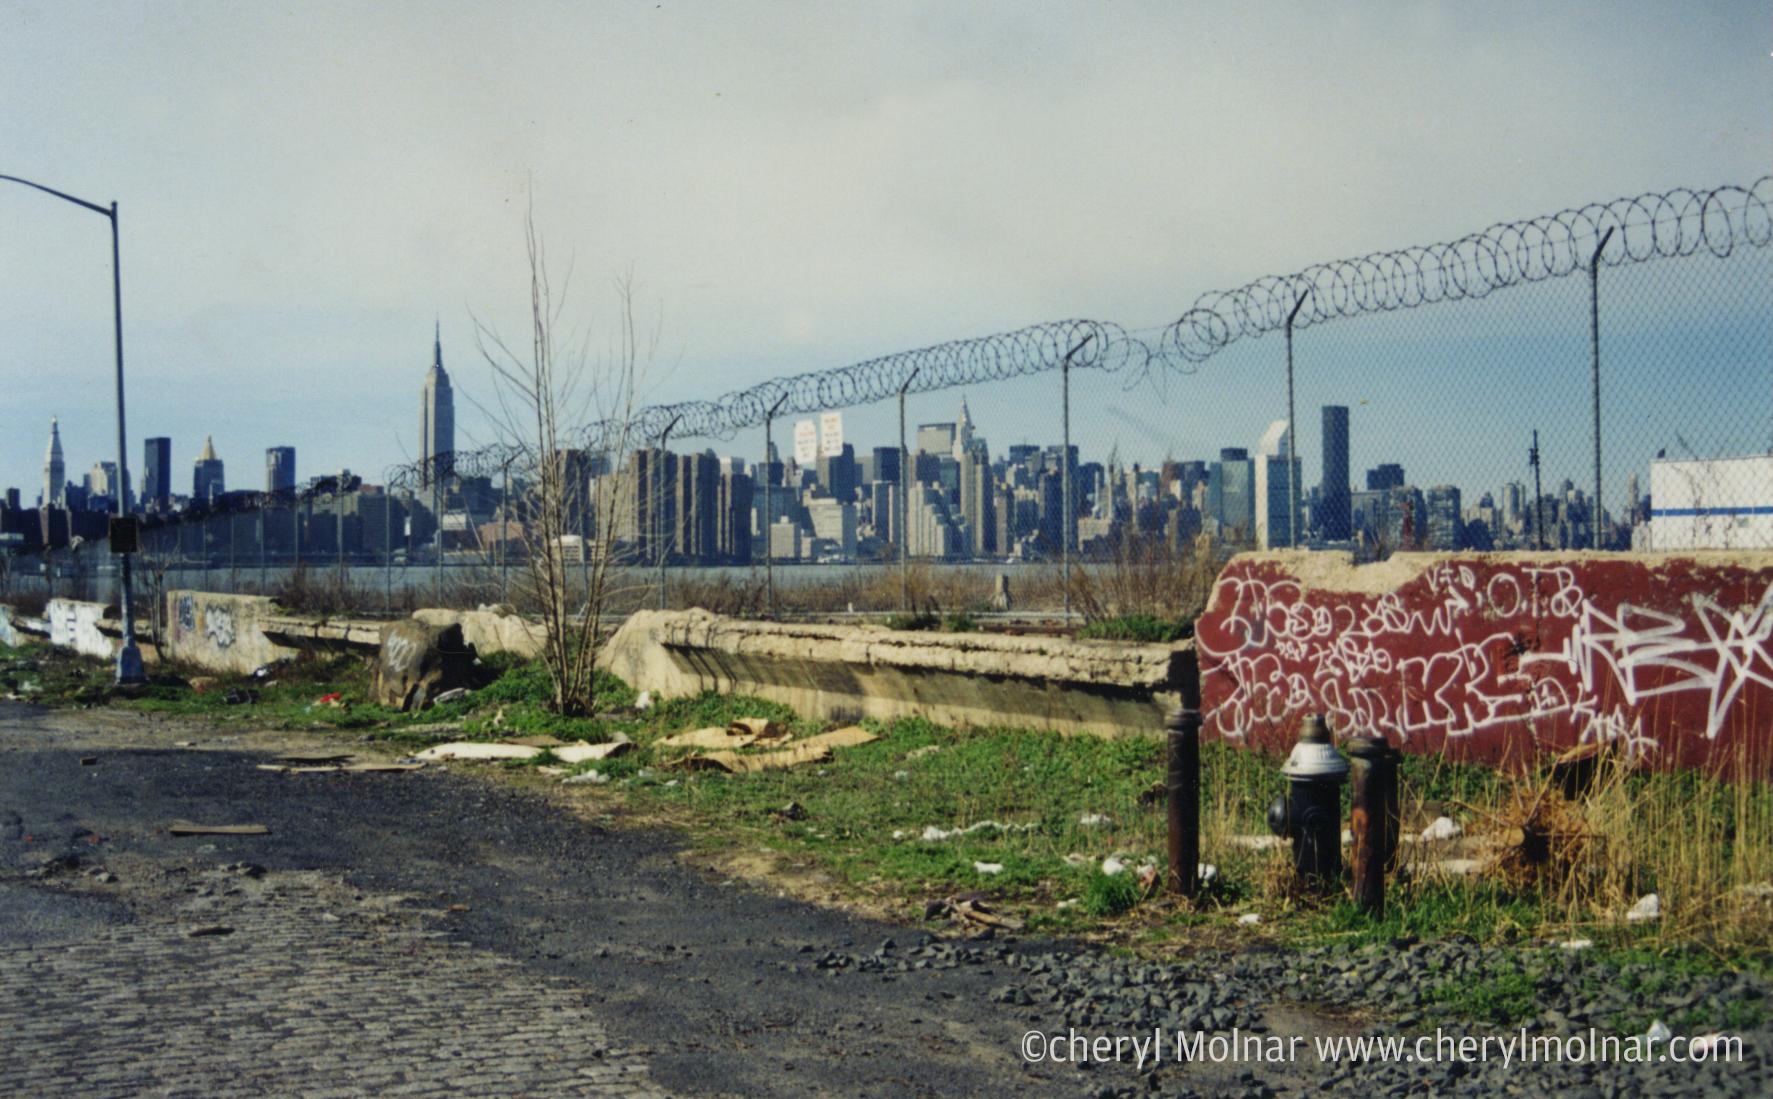 North 7th St. in 2001